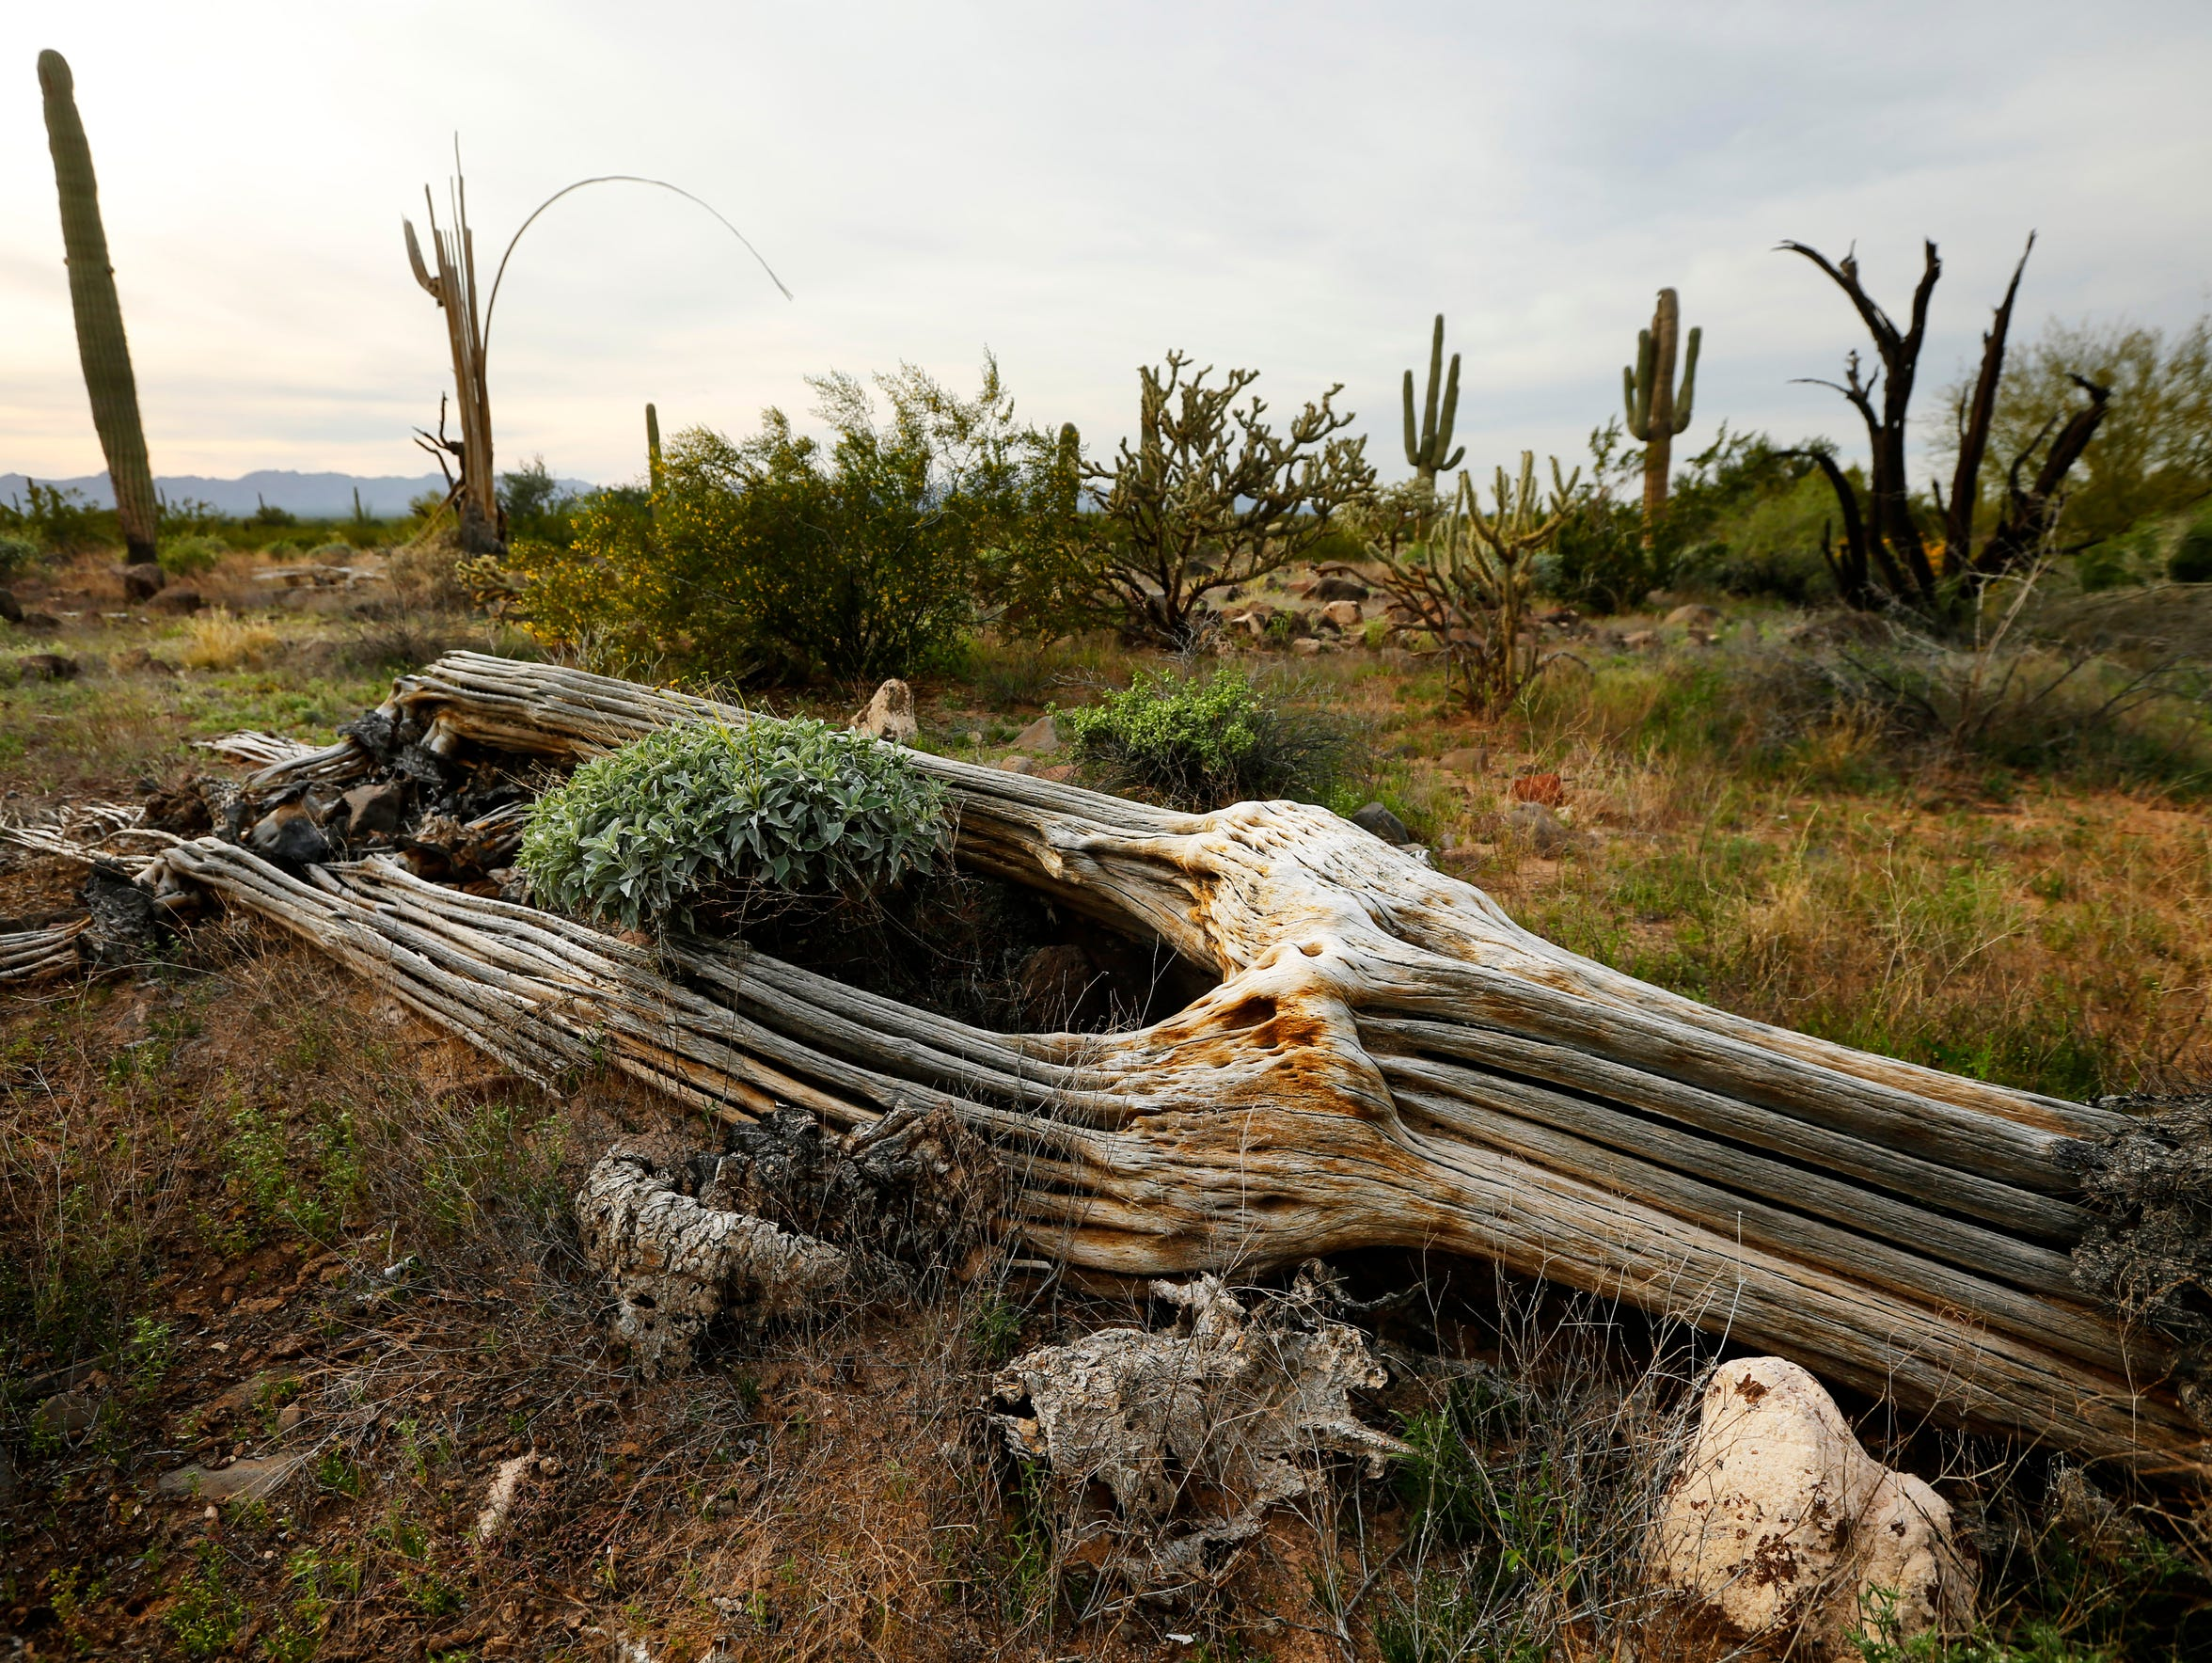 The skeleton of  Saguaro cactus in the Cabeza Prieta